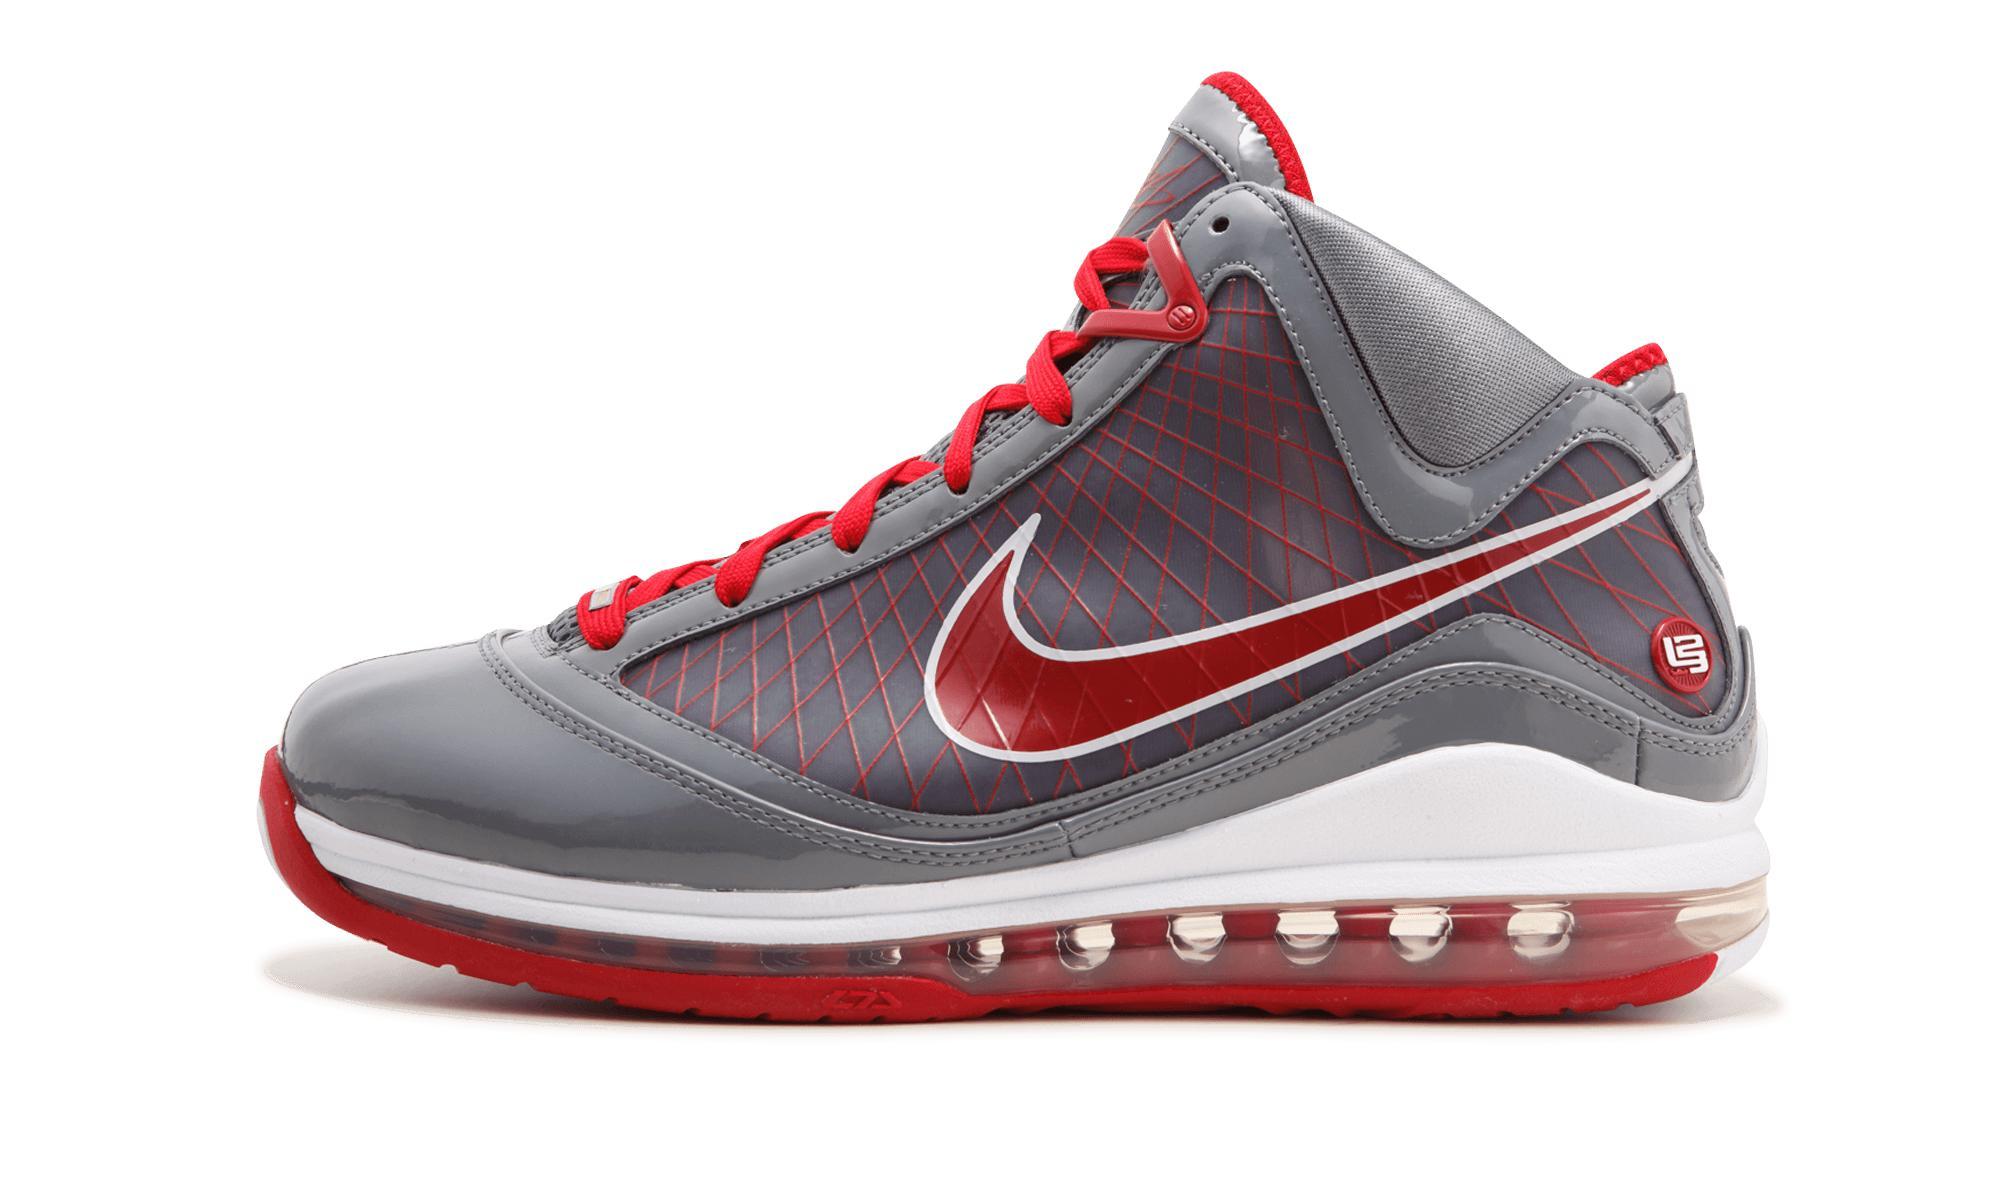 a31d90ad0f5 Nike Air Max Lebron 7 Tb in Red for Men - Save 5% - Lyst